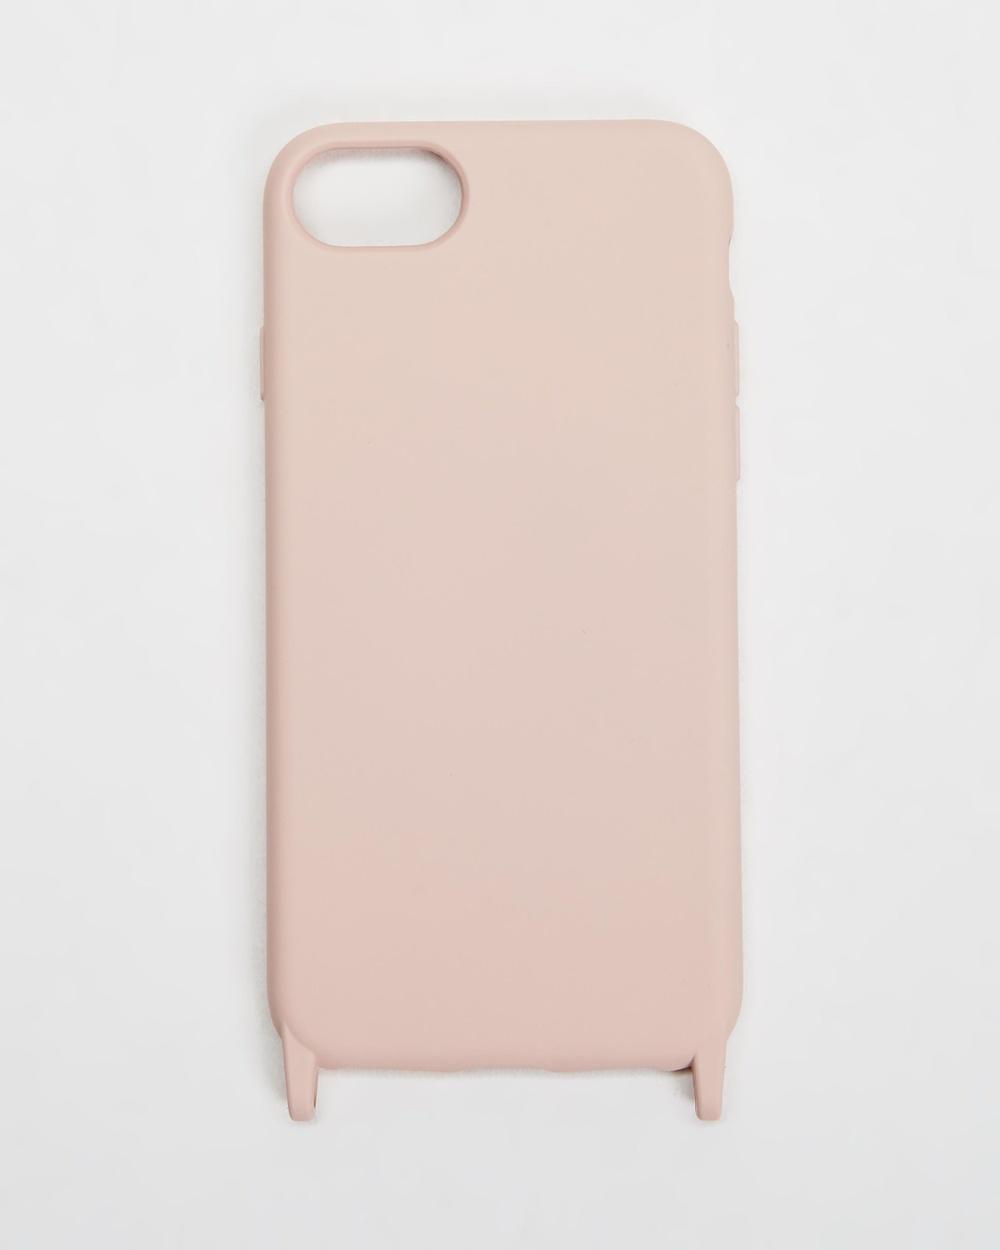 Chuchka Nylon Silicone Lanyard Phone Case Strap Tech Accessories Nude Pink